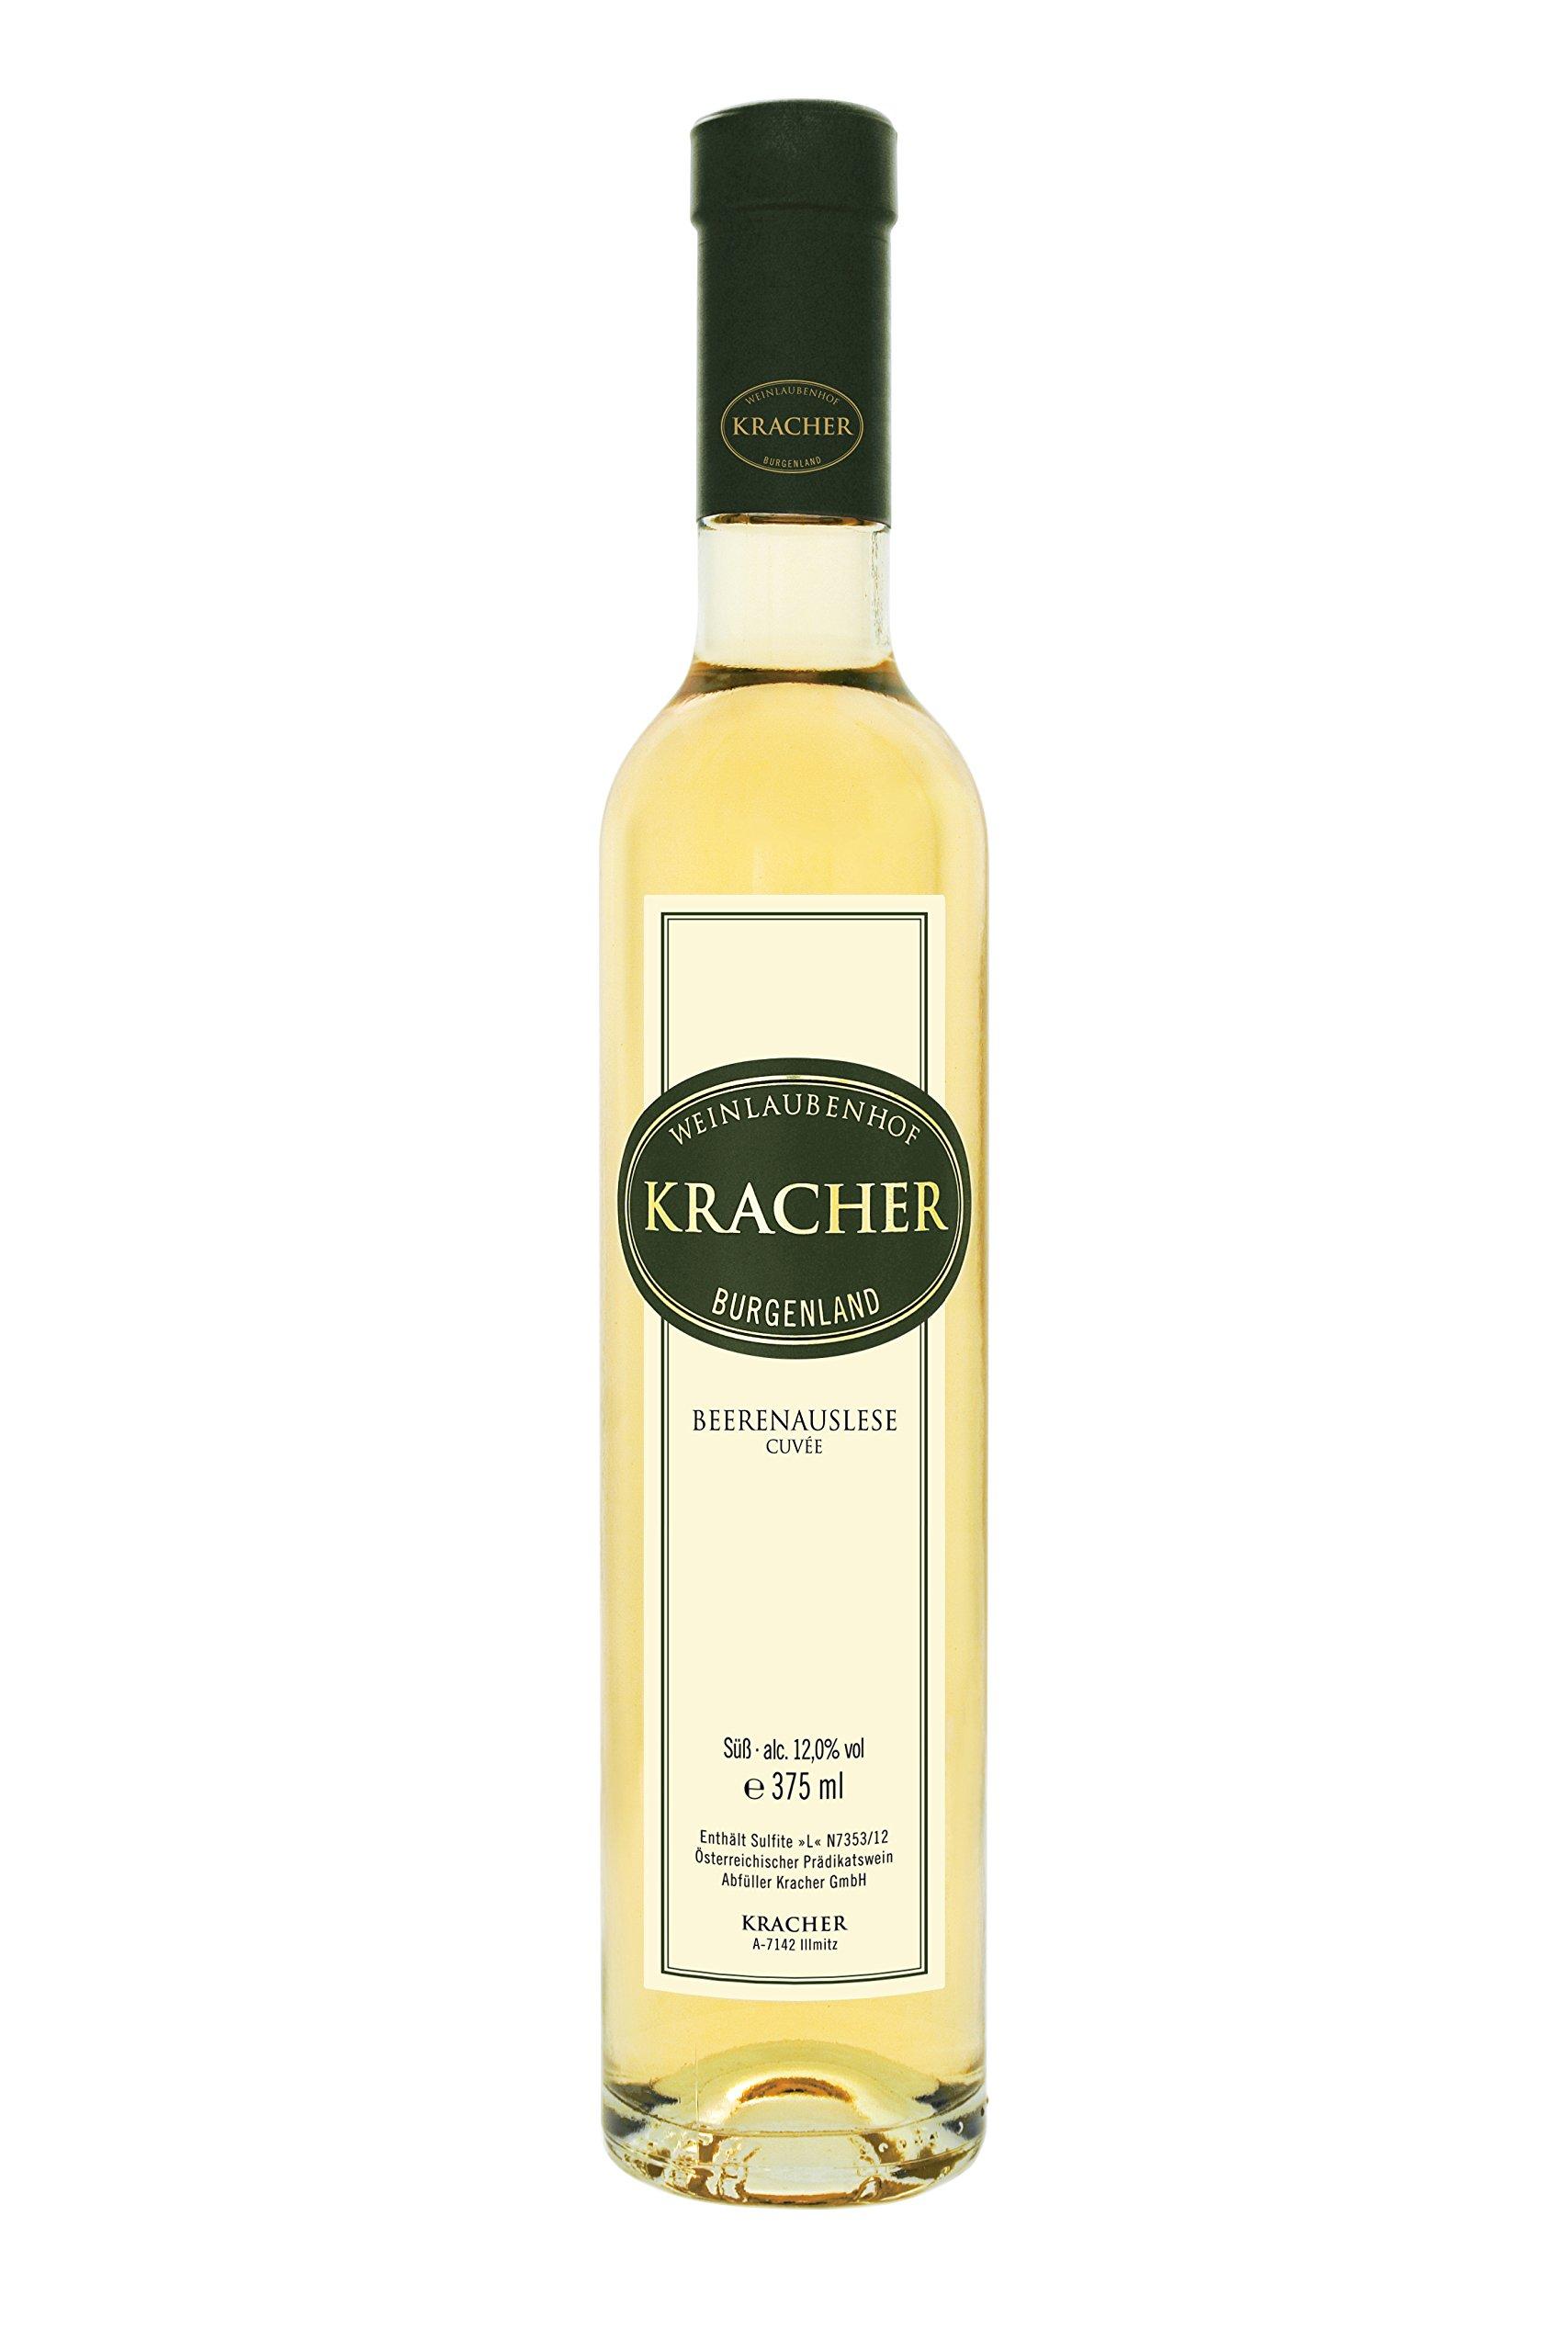 Kracher-Prdikatswein-Beerenauslese